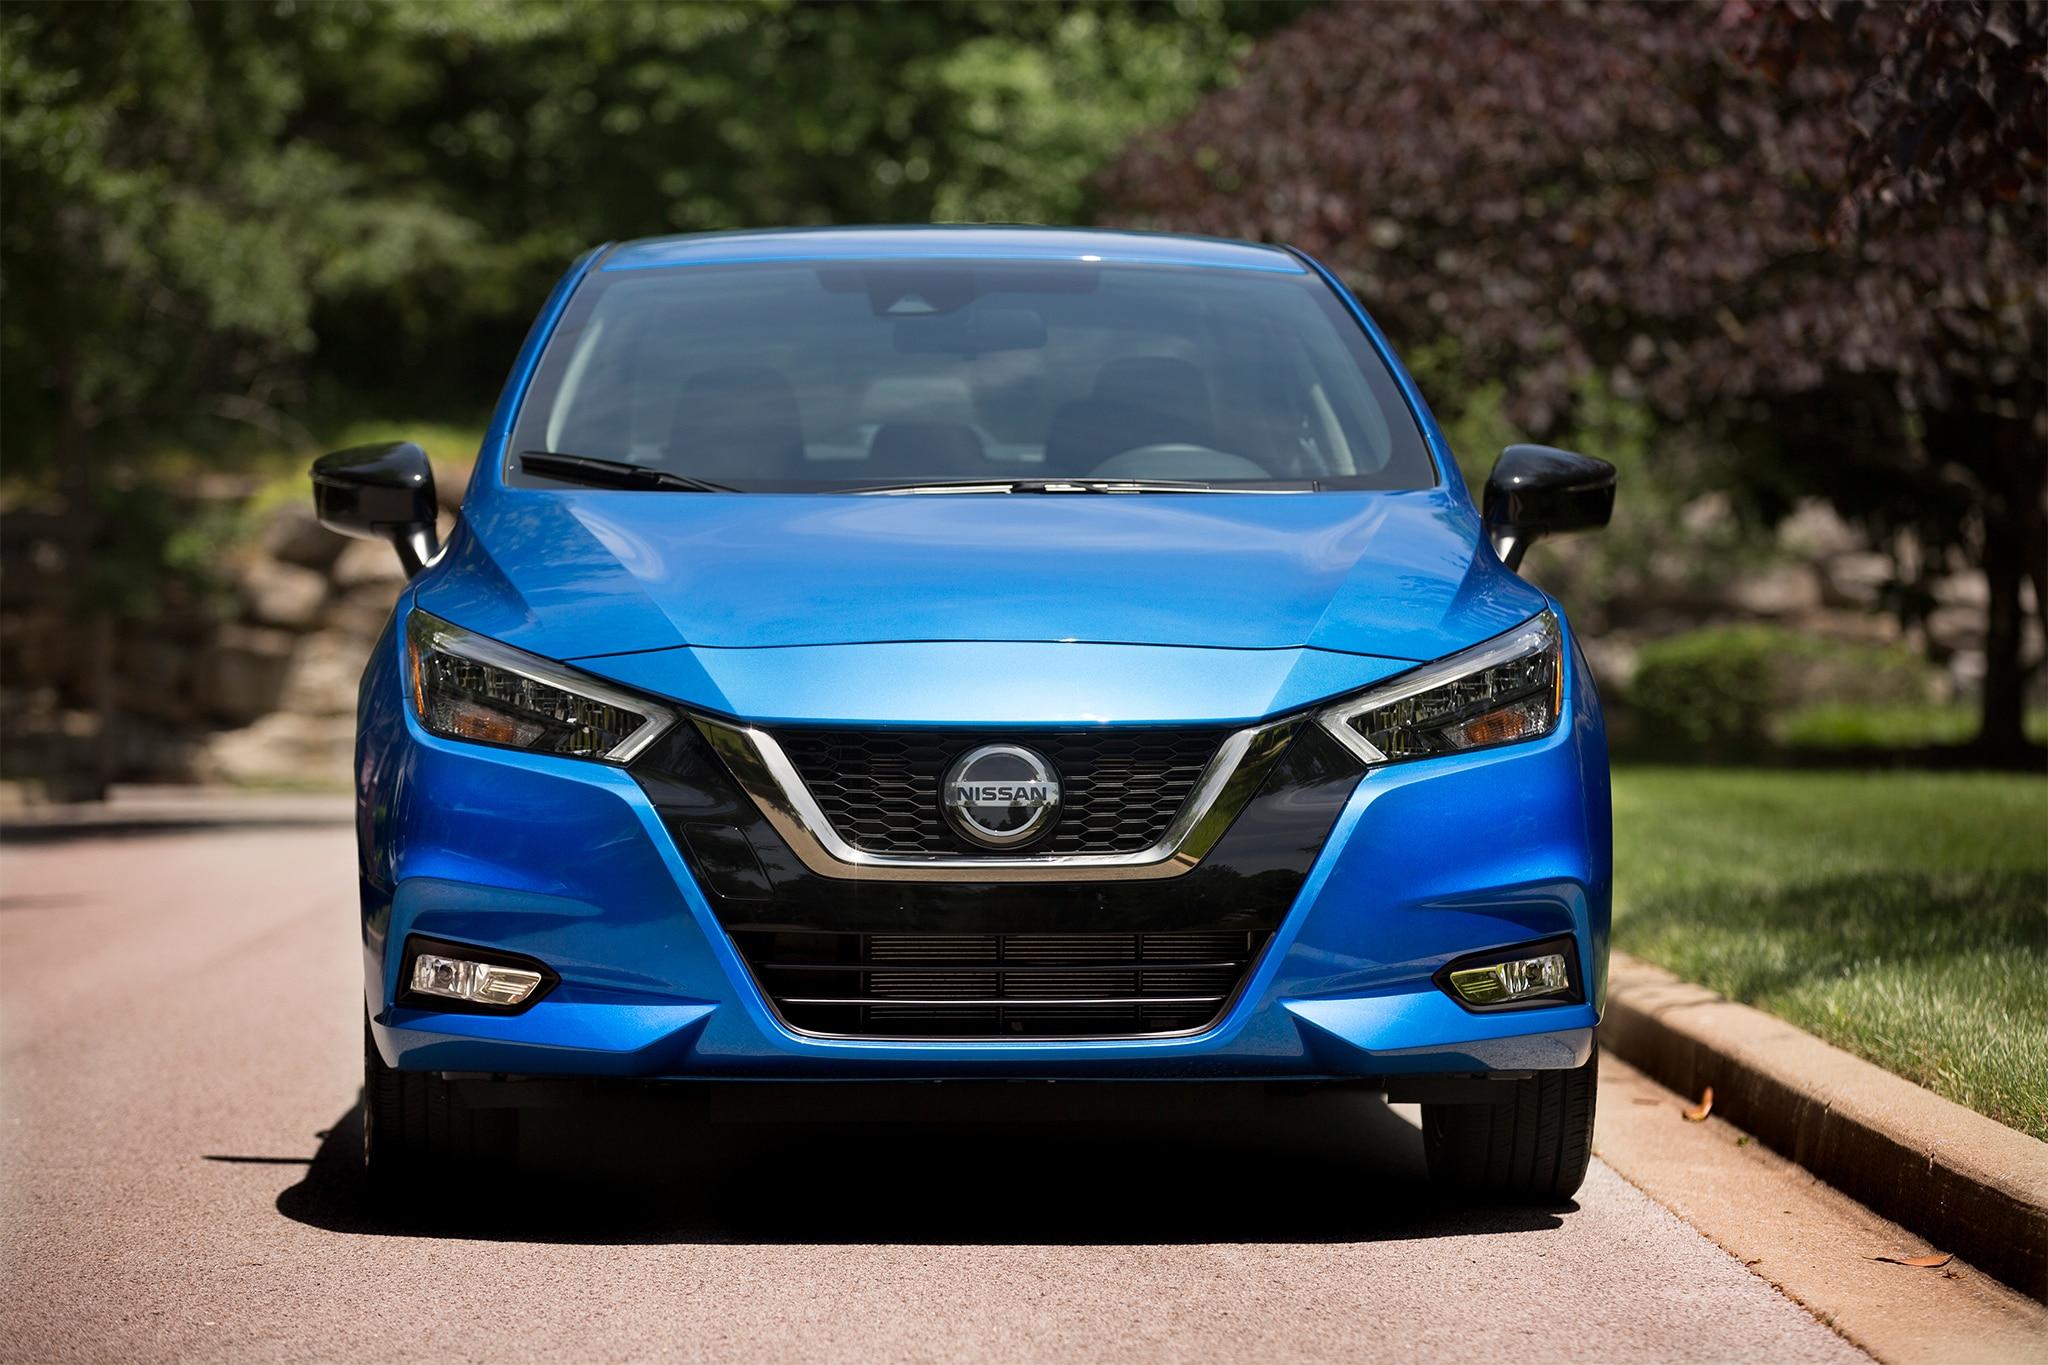 2020 Nissan Versa First Drive Review: Better and Still ...